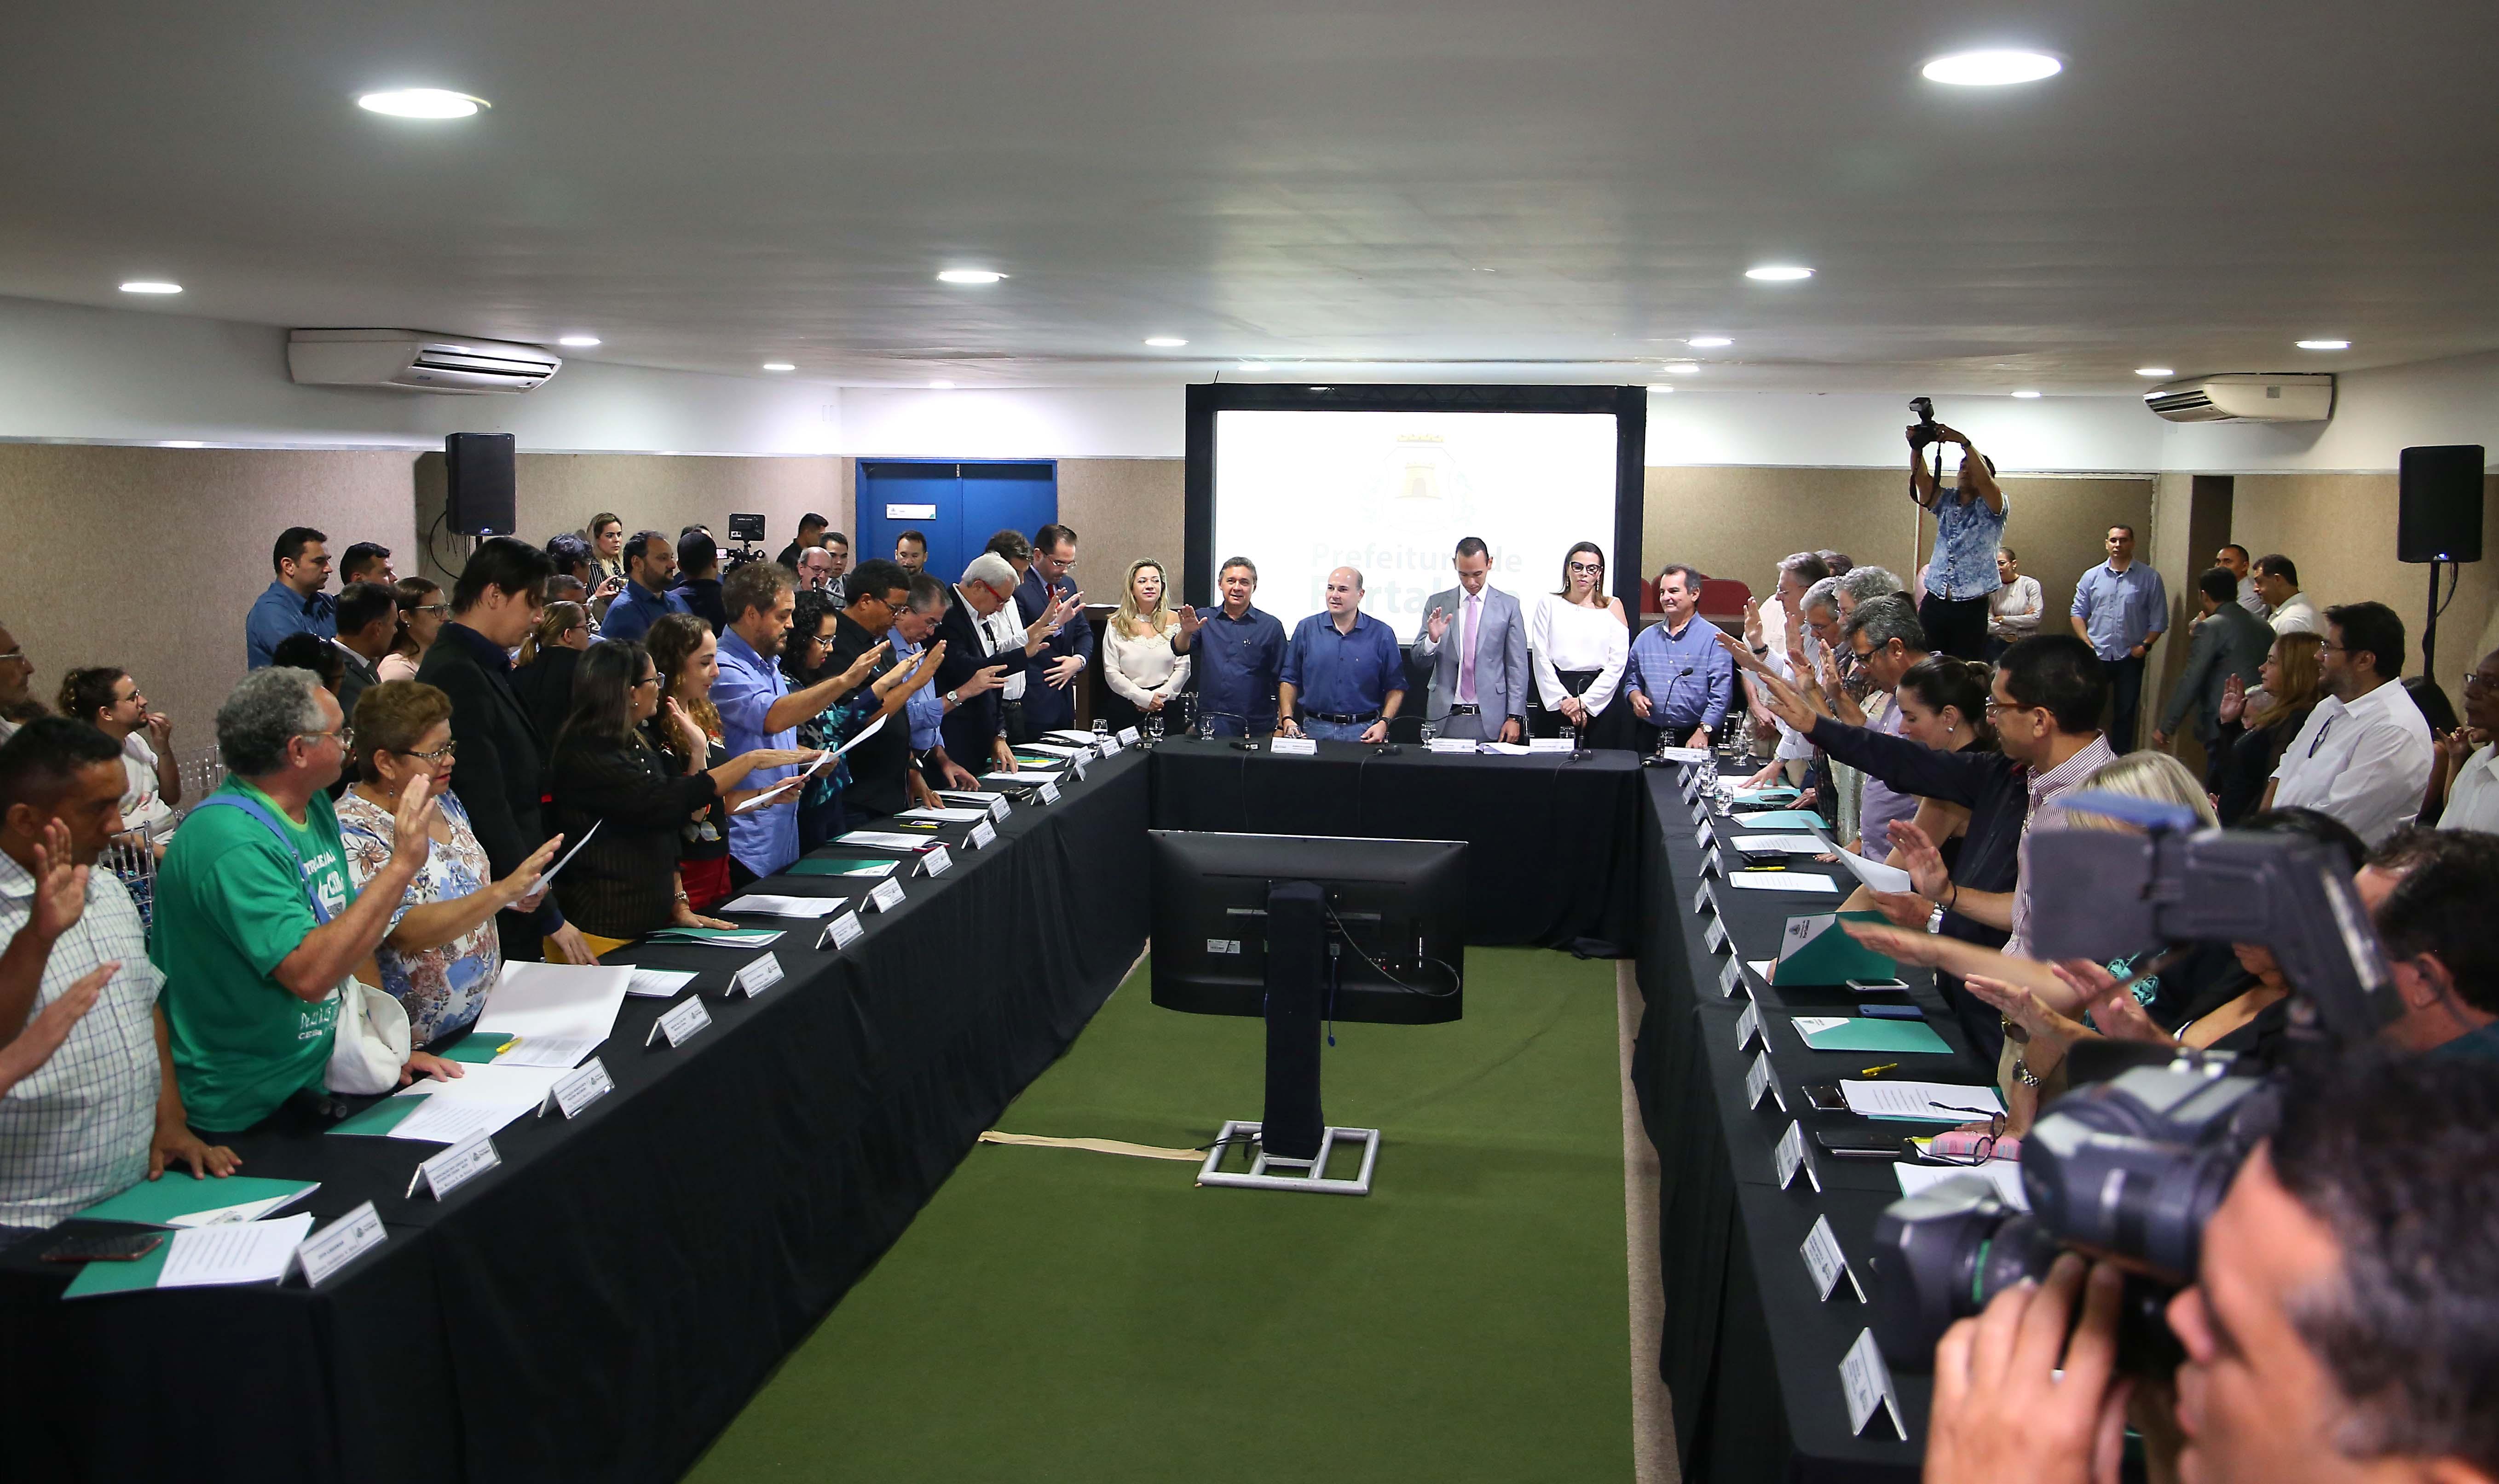 Presidente do Sinditaxi é empossado membro do Núcleo Gestor da Prefeitura de Fortaleza